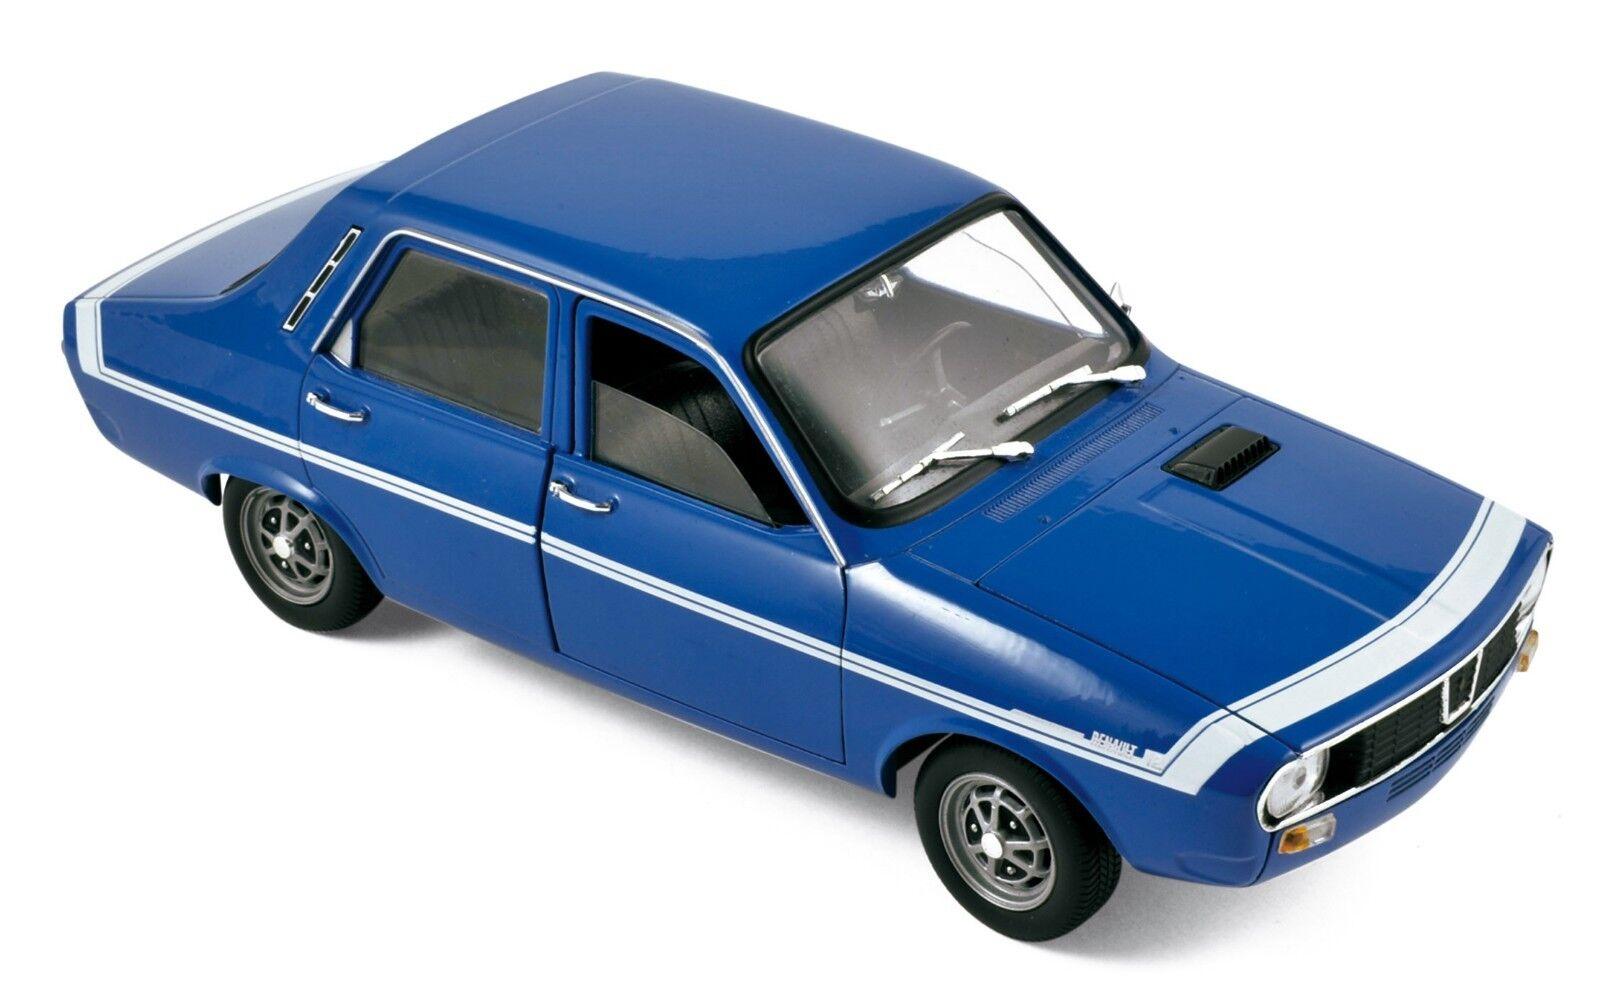 Stunning 1971 renault 12 gordini bluee France-norev 1 18 ° new in box